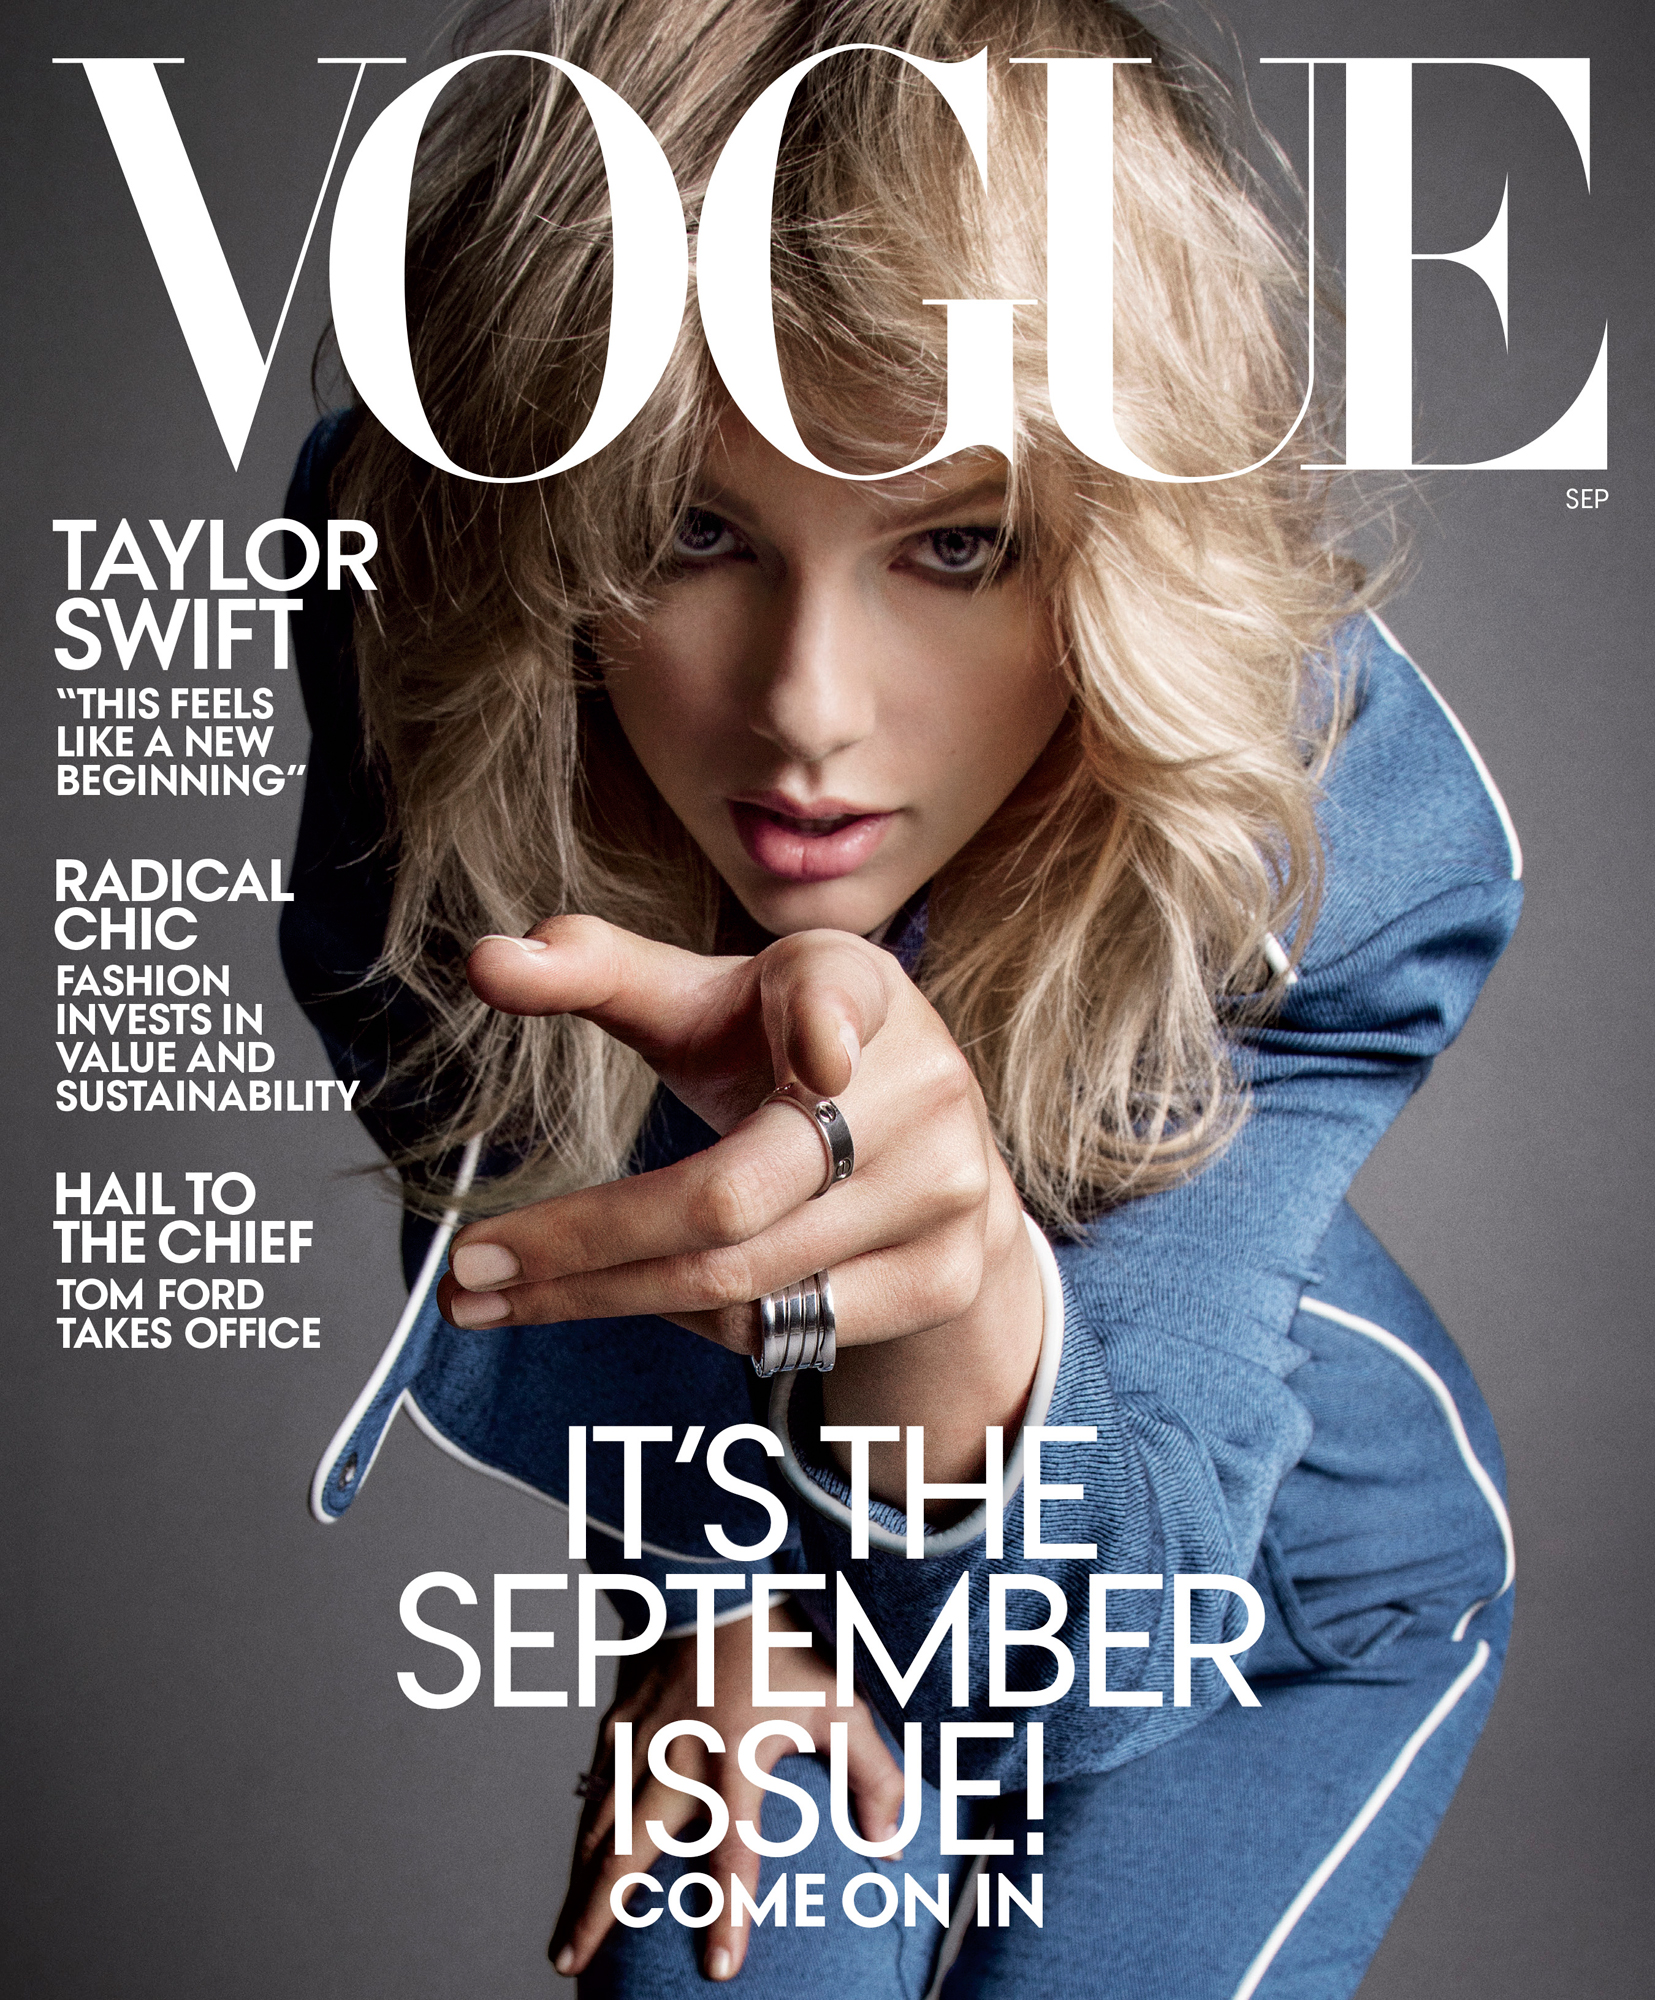 Taylor-Swift-Vogue-September-Cover